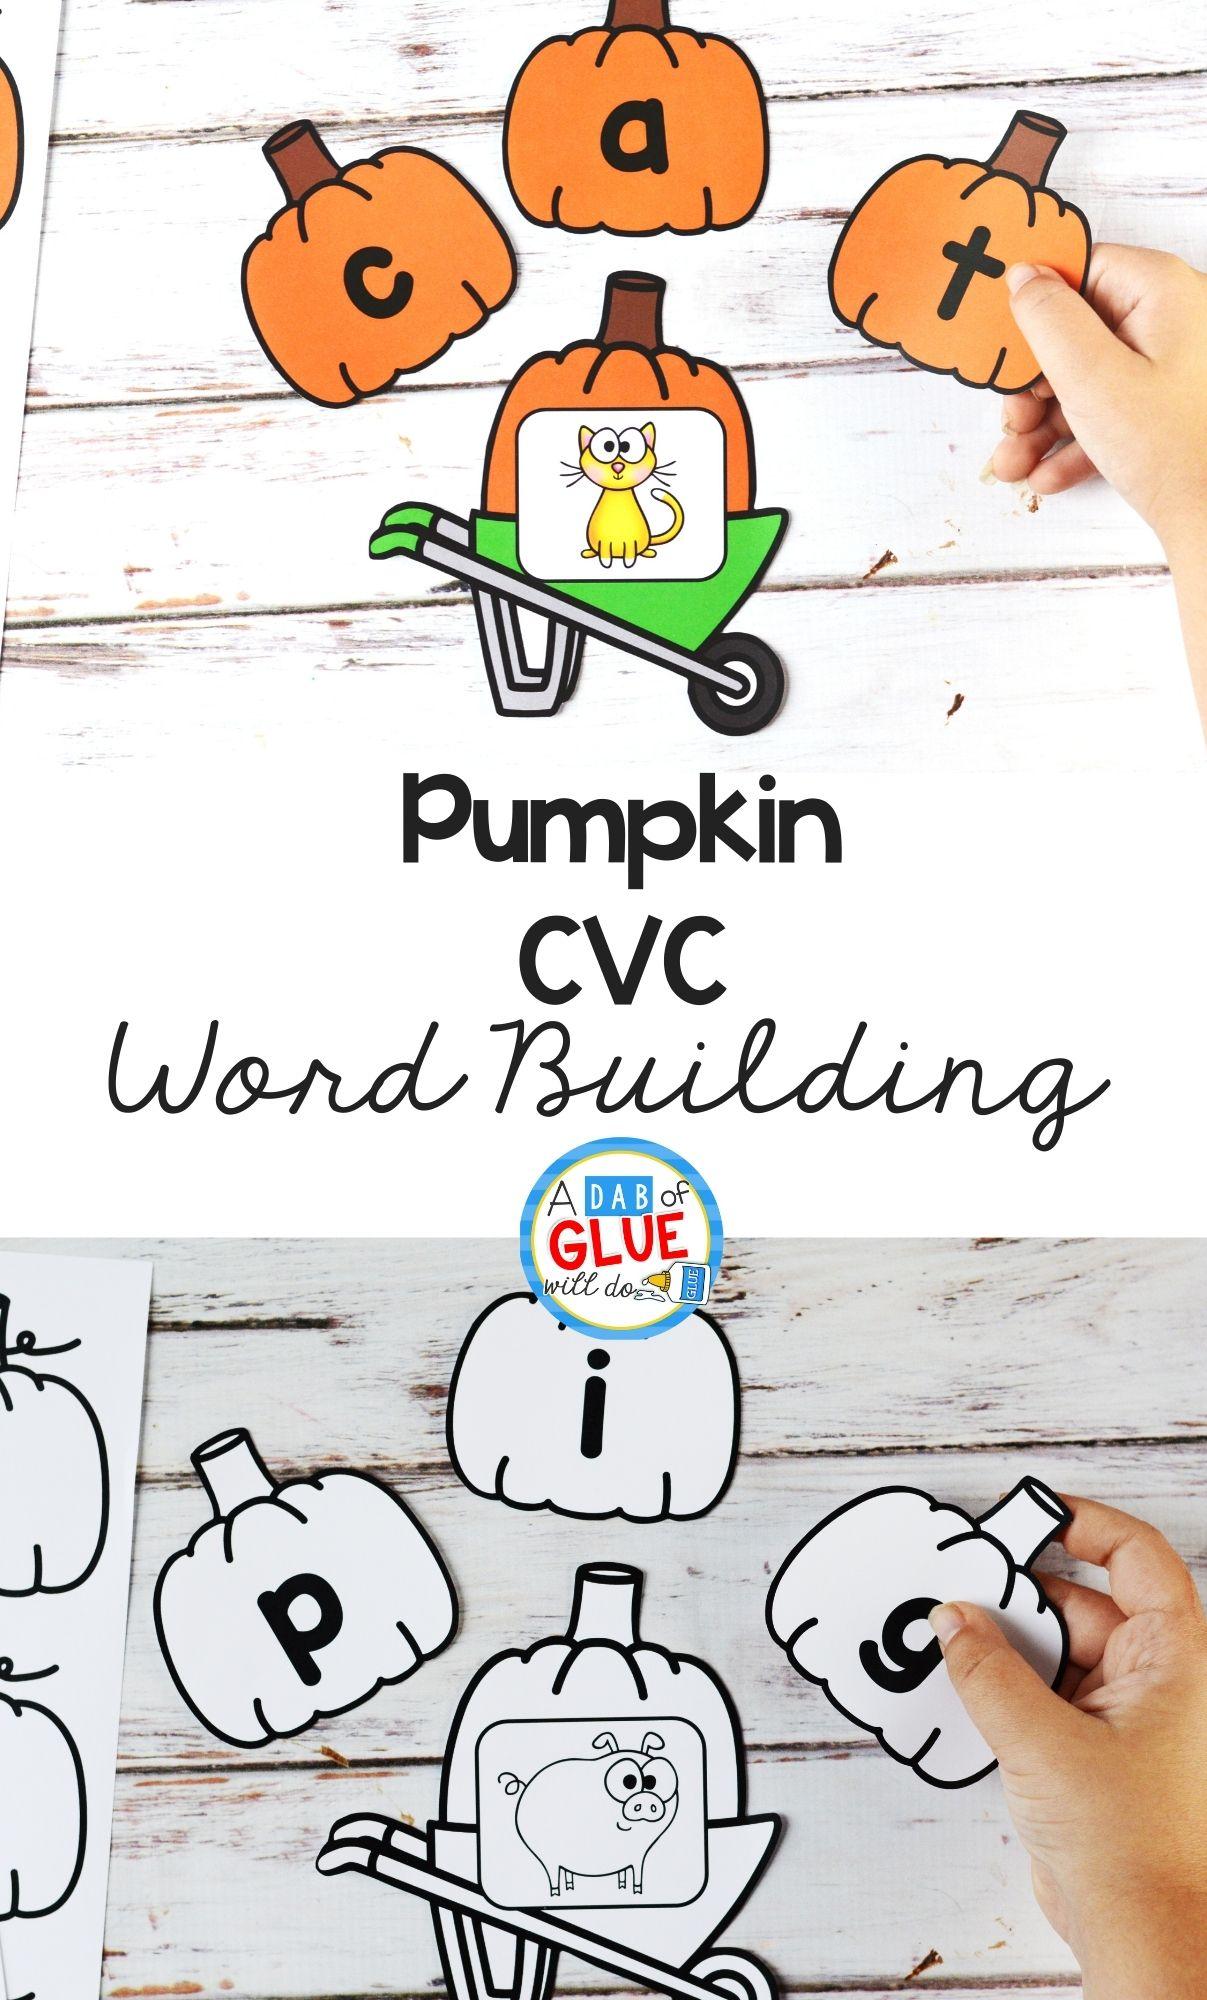 Pumpkin CVC Word Building Activity